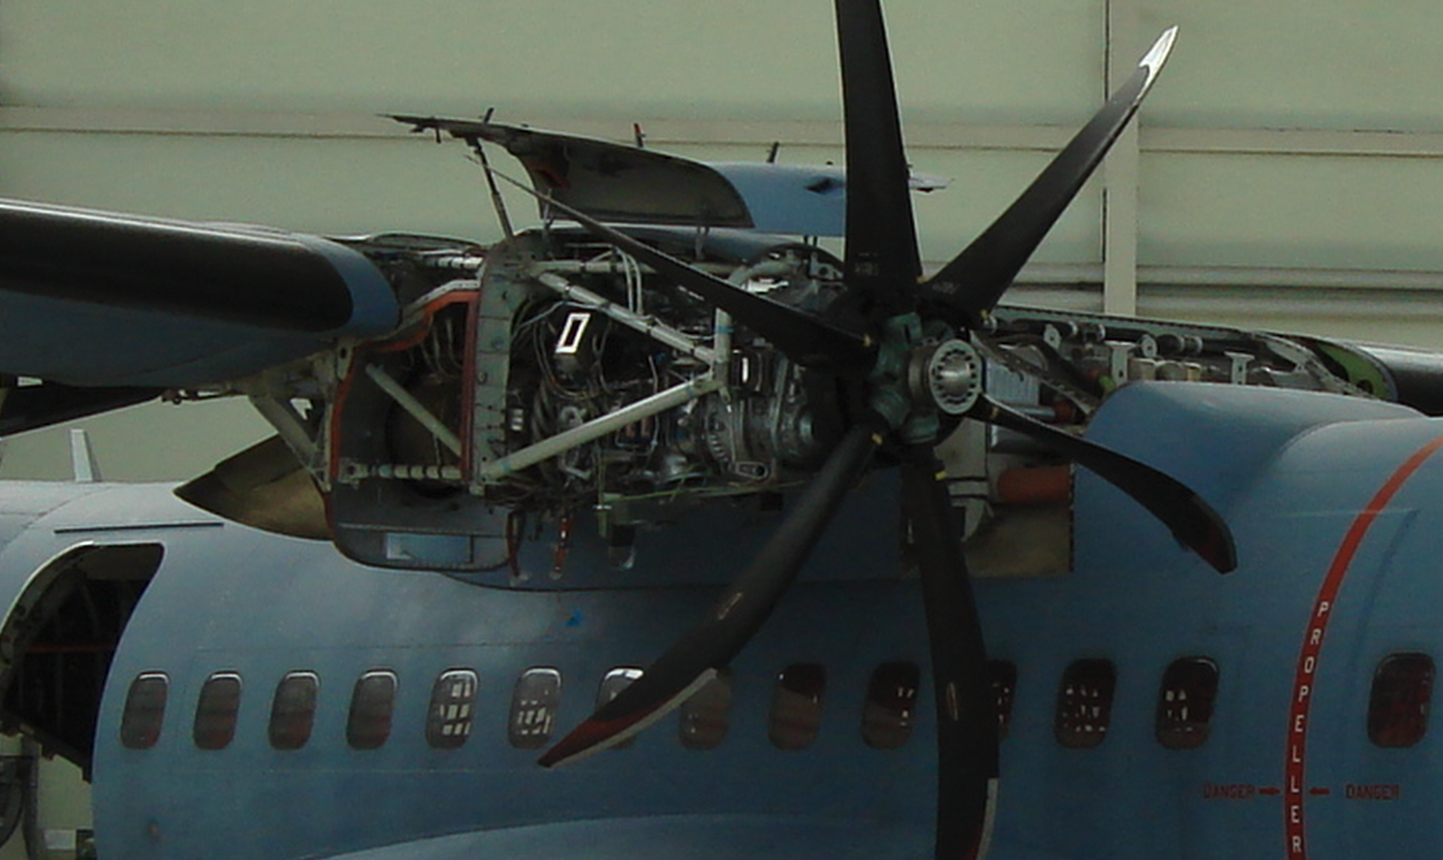 CASA C-295 M nb 013. 2008. Photo by Karol Placha Hetman